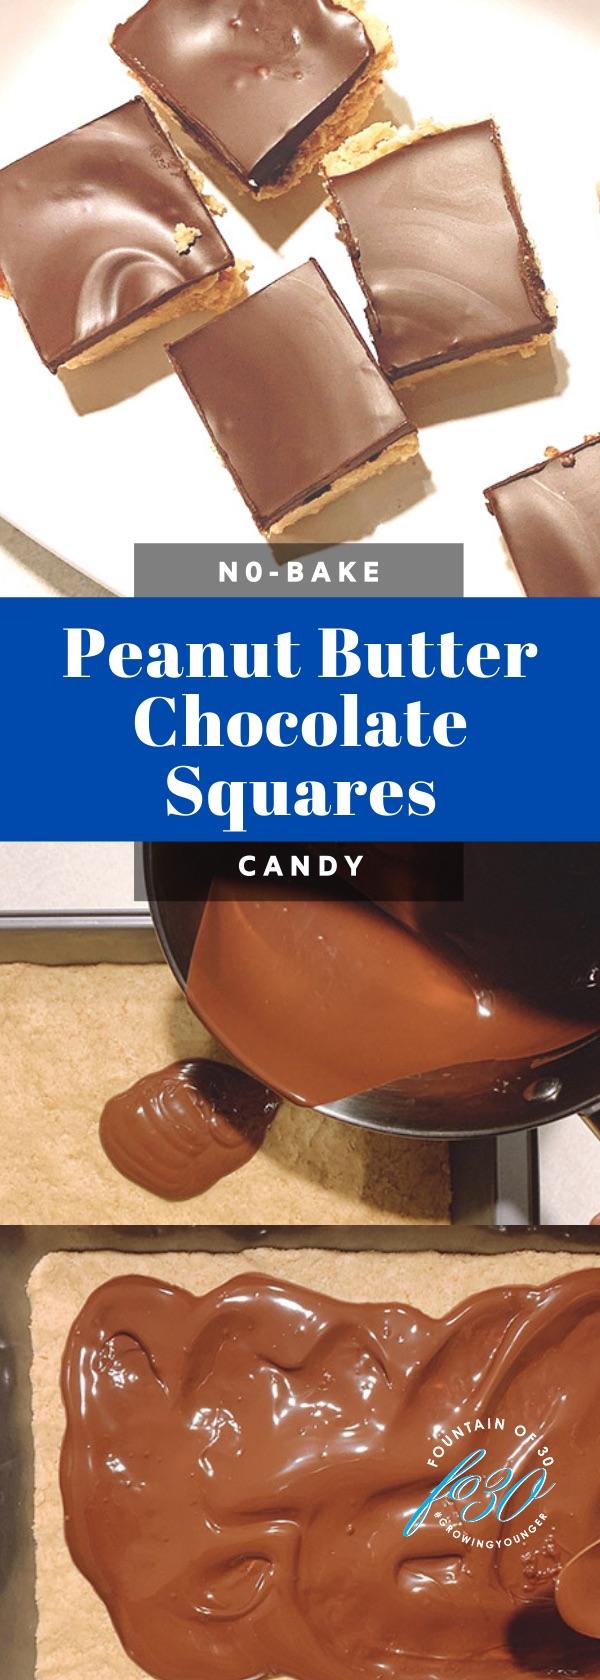 peanut butter cups fountainof30